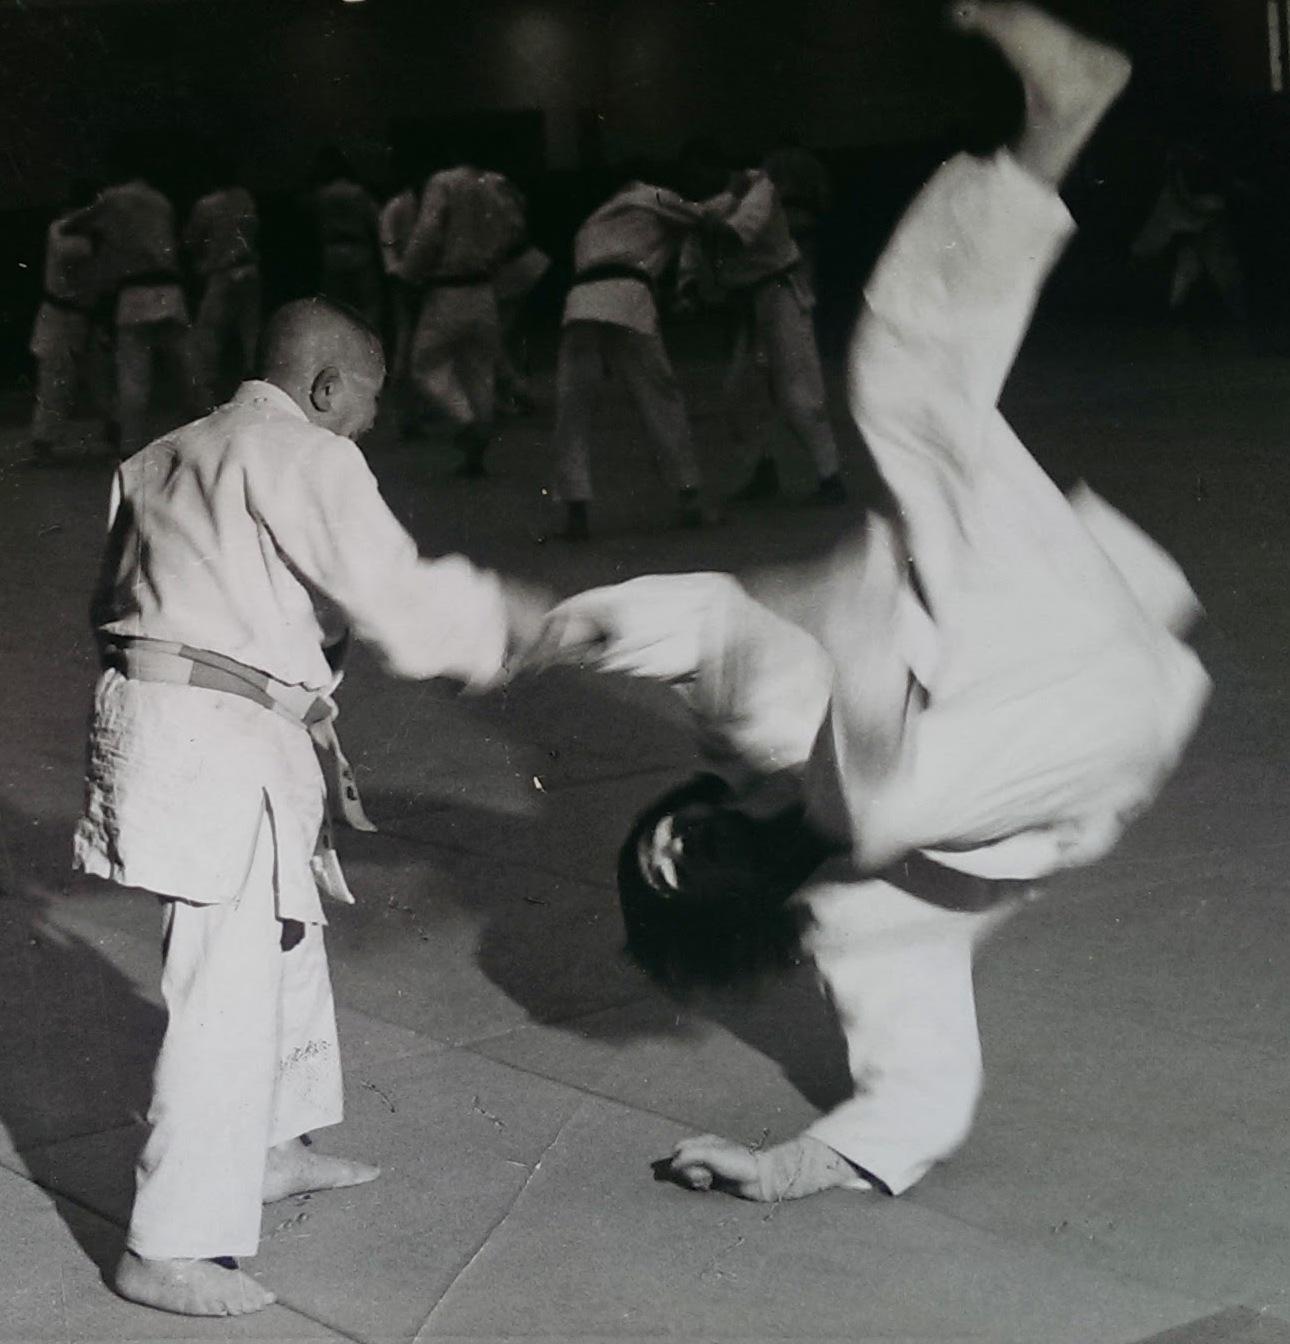 Lutz Lischka 1973